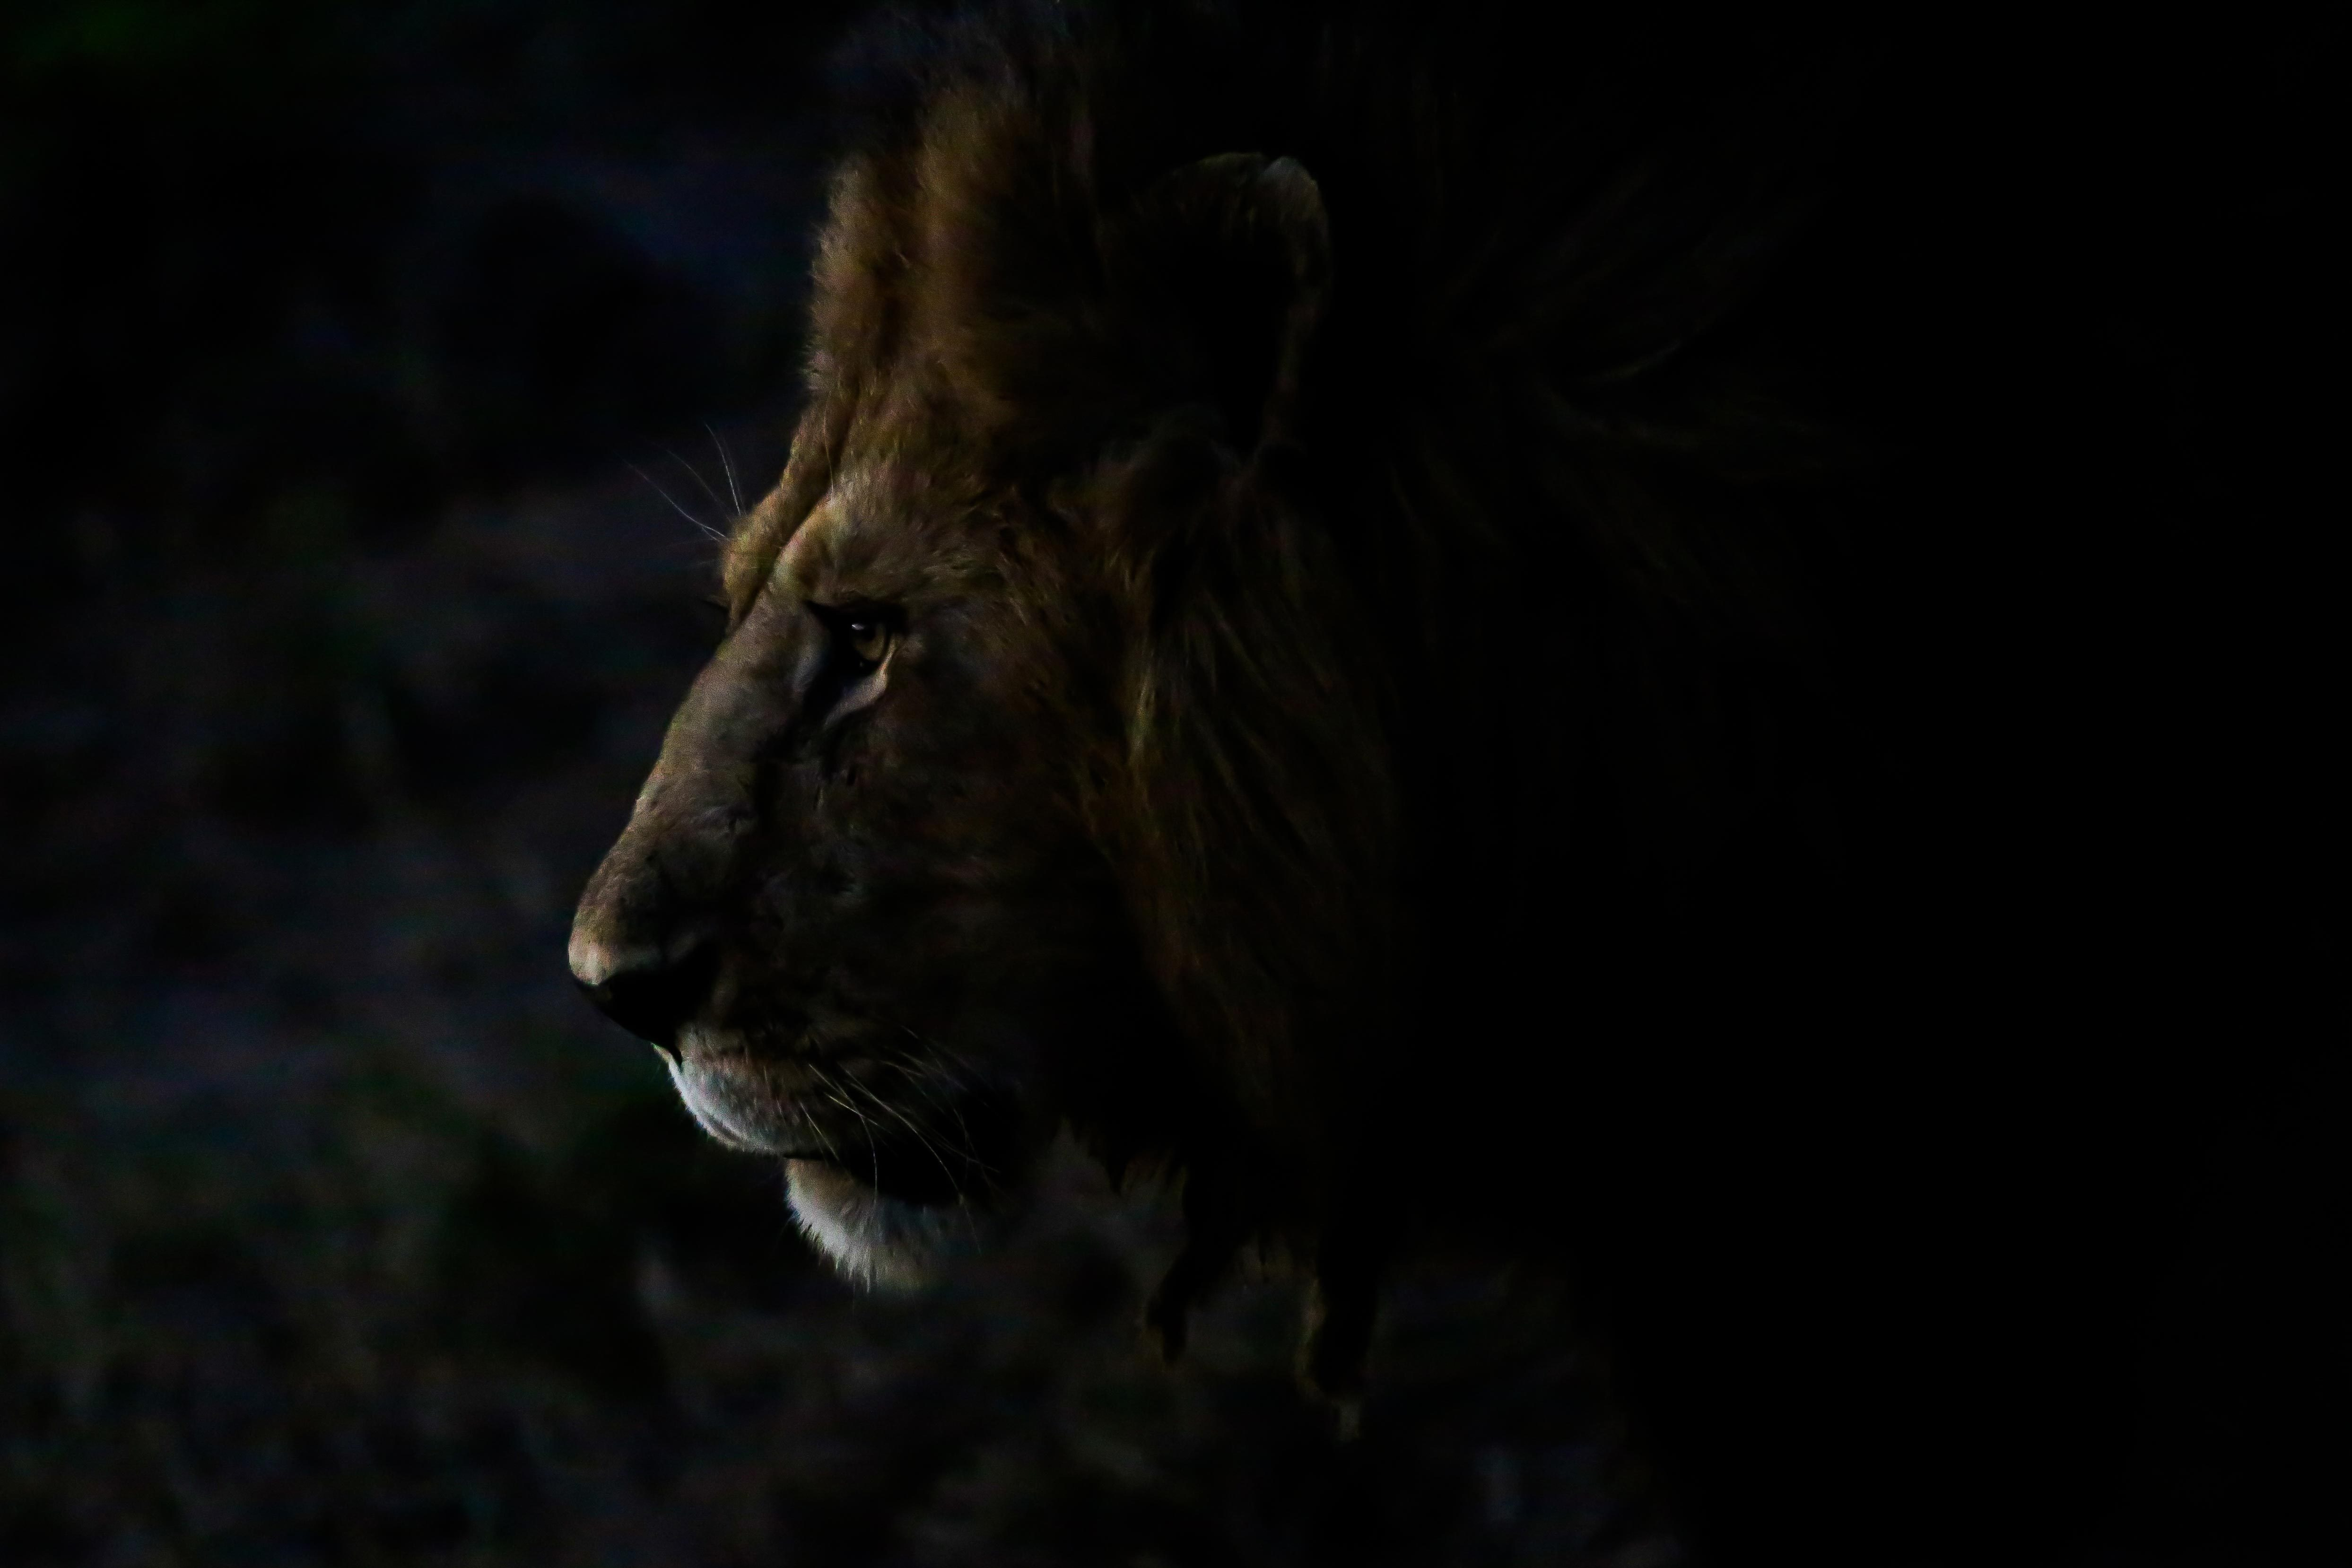 lion in low light